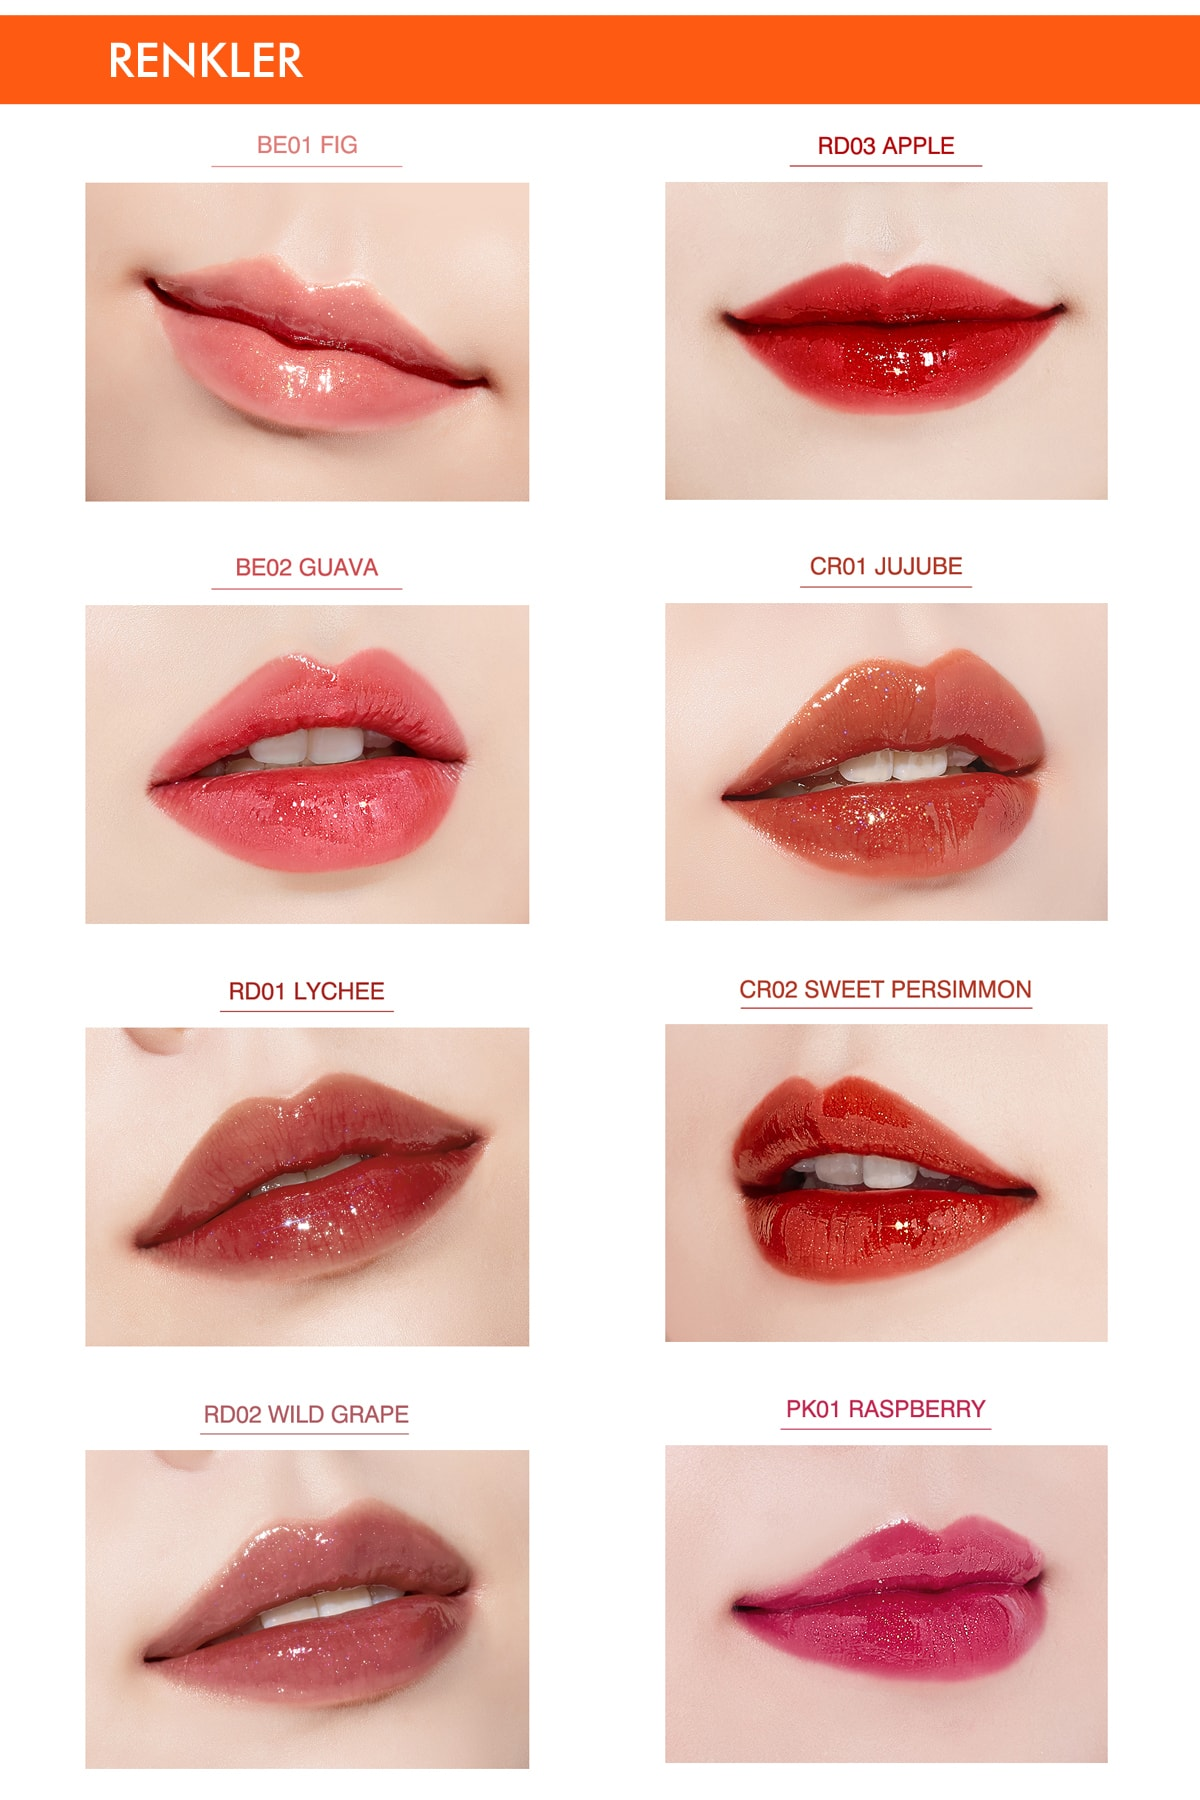 Missha Işıltı&Dolgunluk Veren  Parlak Gloss Tint APIEU Juicy-Pang Sparkling Tint CR01 2